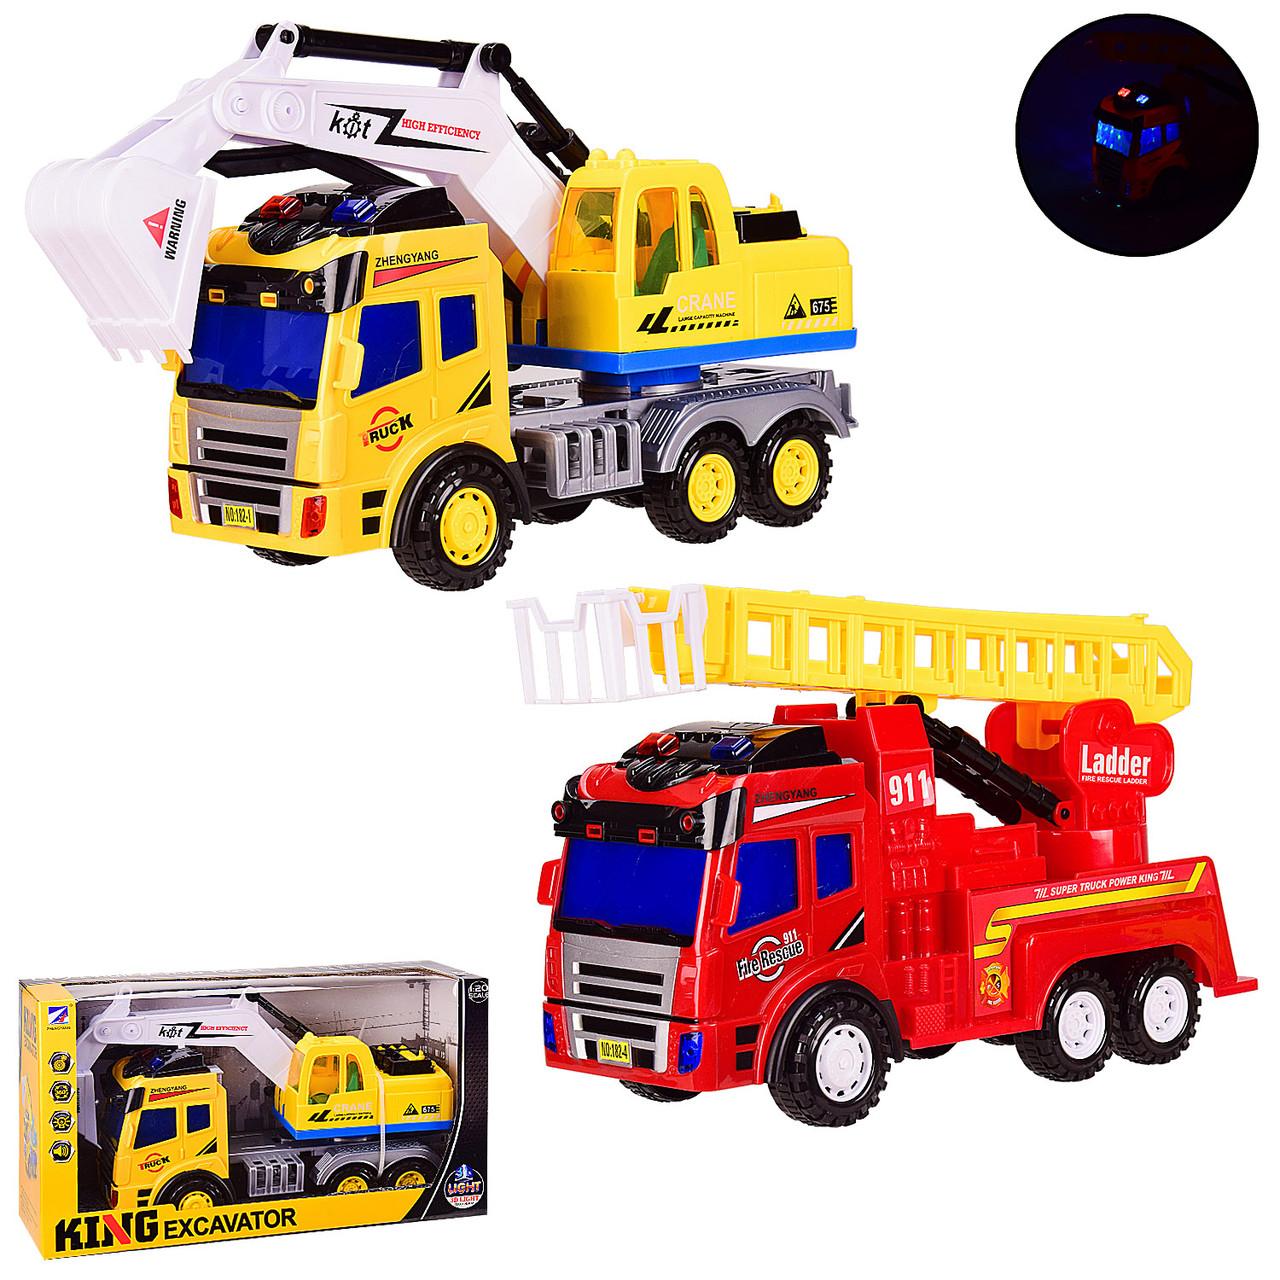 Машина батар. 182-1/182-4 (18шт) 2вида: эксаватор и пожарная машина, свет, р-р игрушки 36,5*13*20см, в кор.